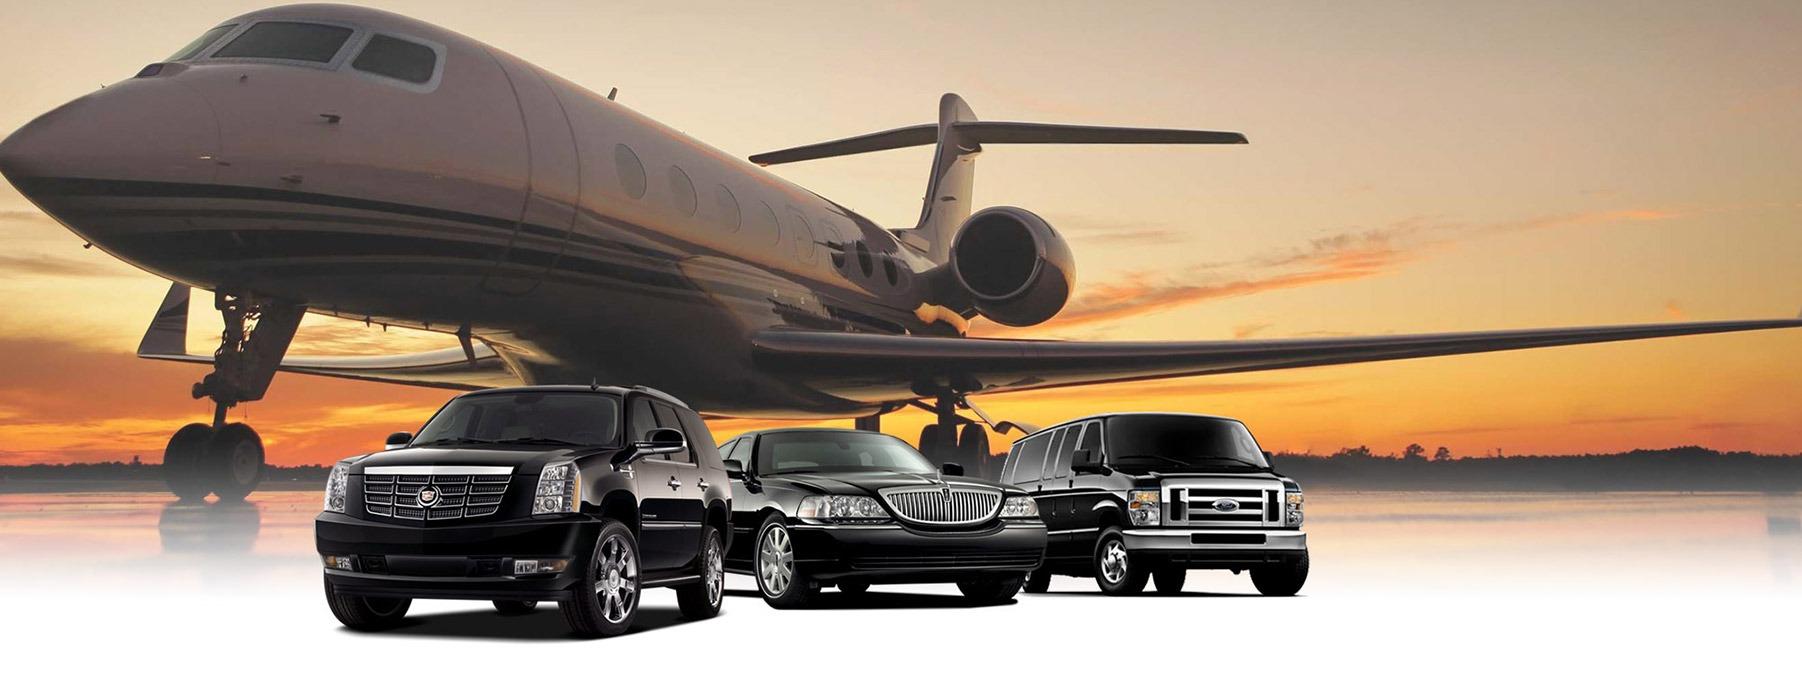 Airport Transportation DC